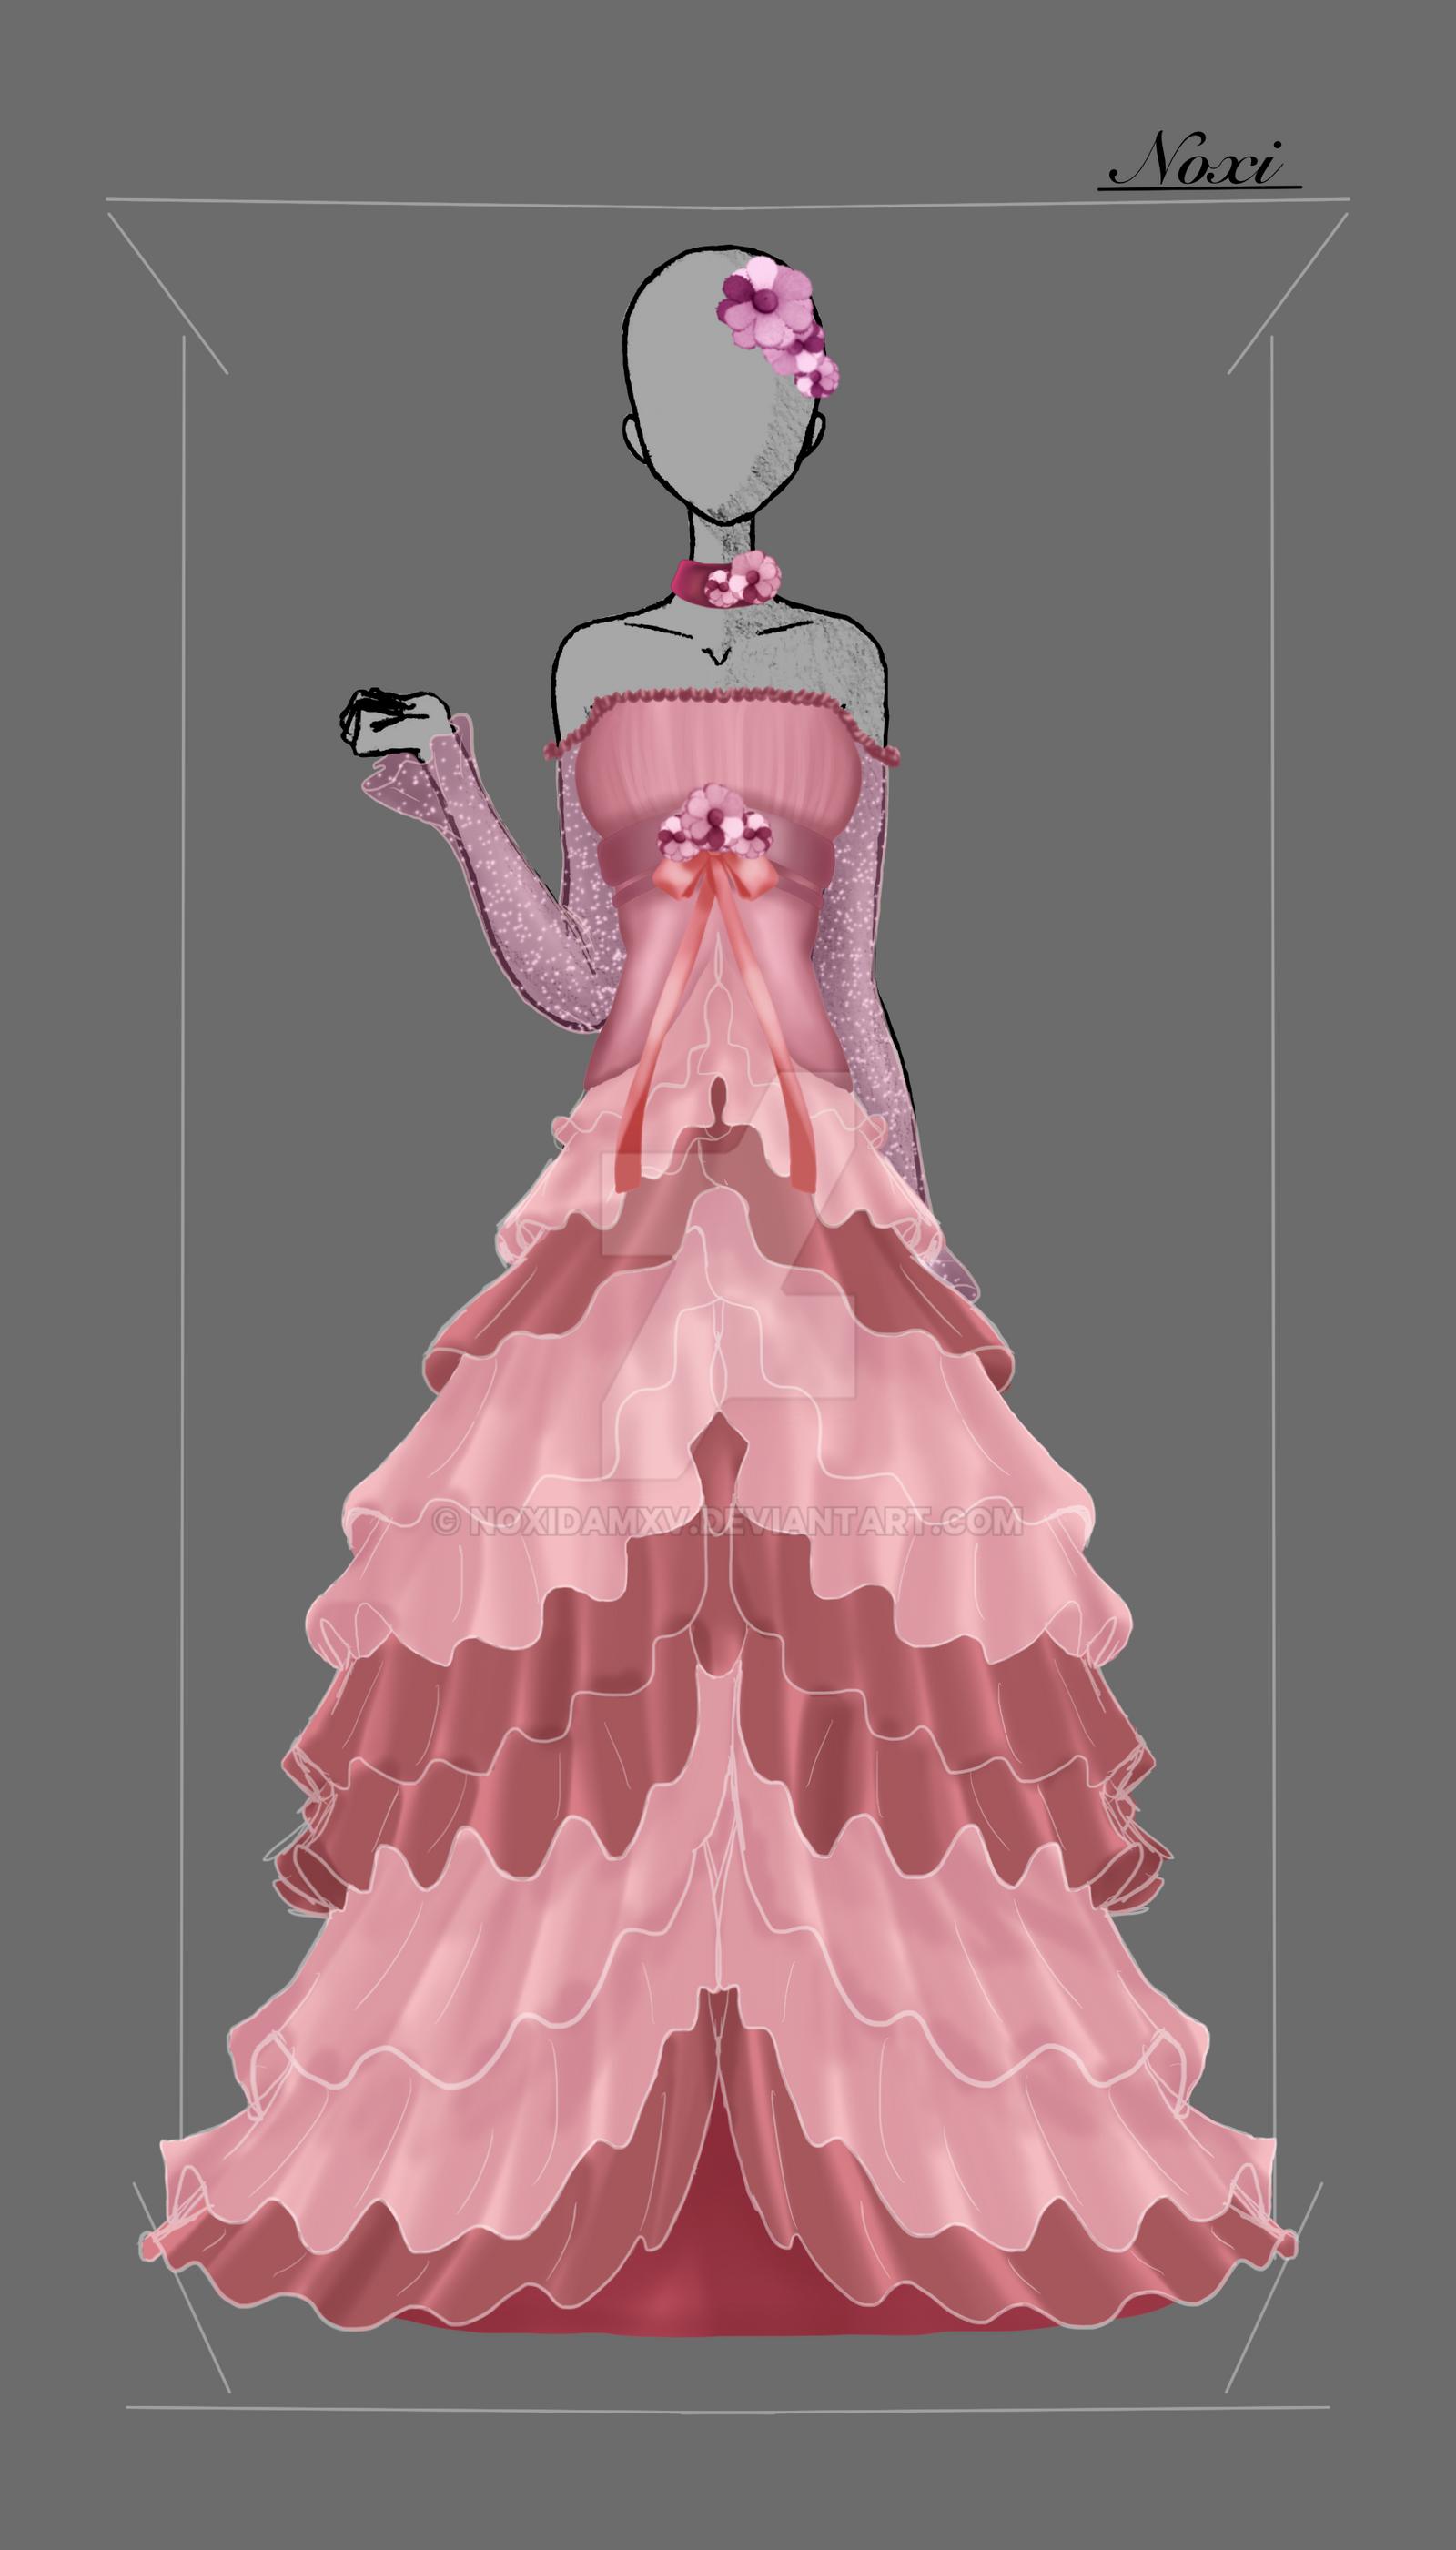 Dress Design: Trusts' Wedding Dress by NoxidamXV